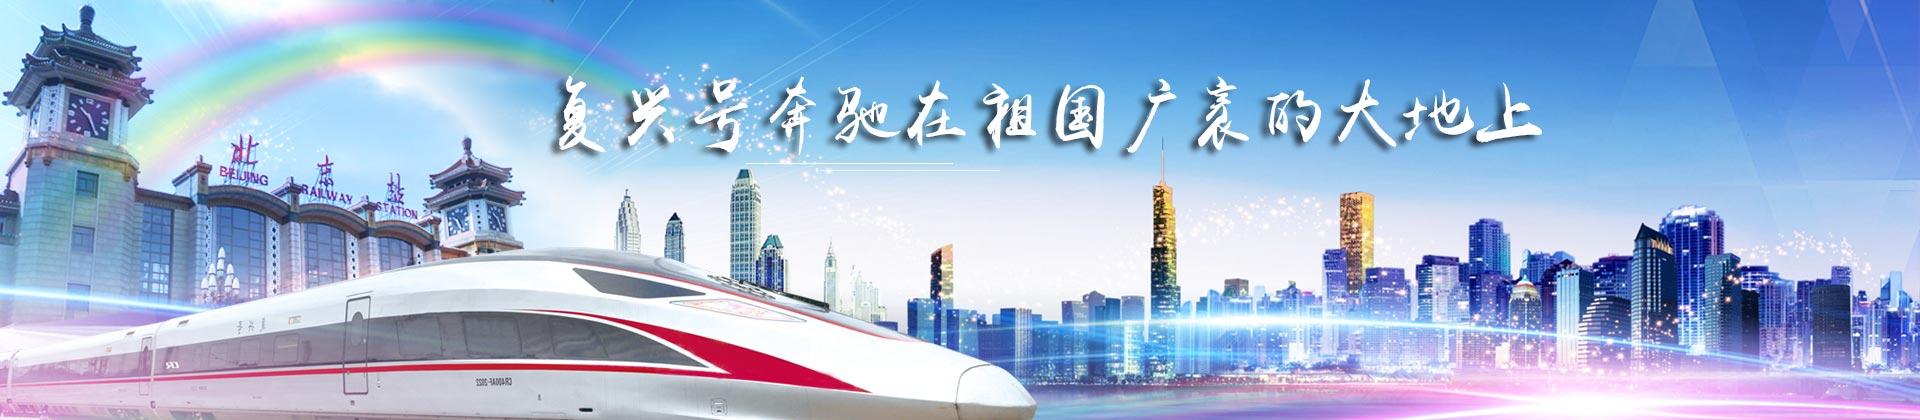 banner1刘总做12.jpg